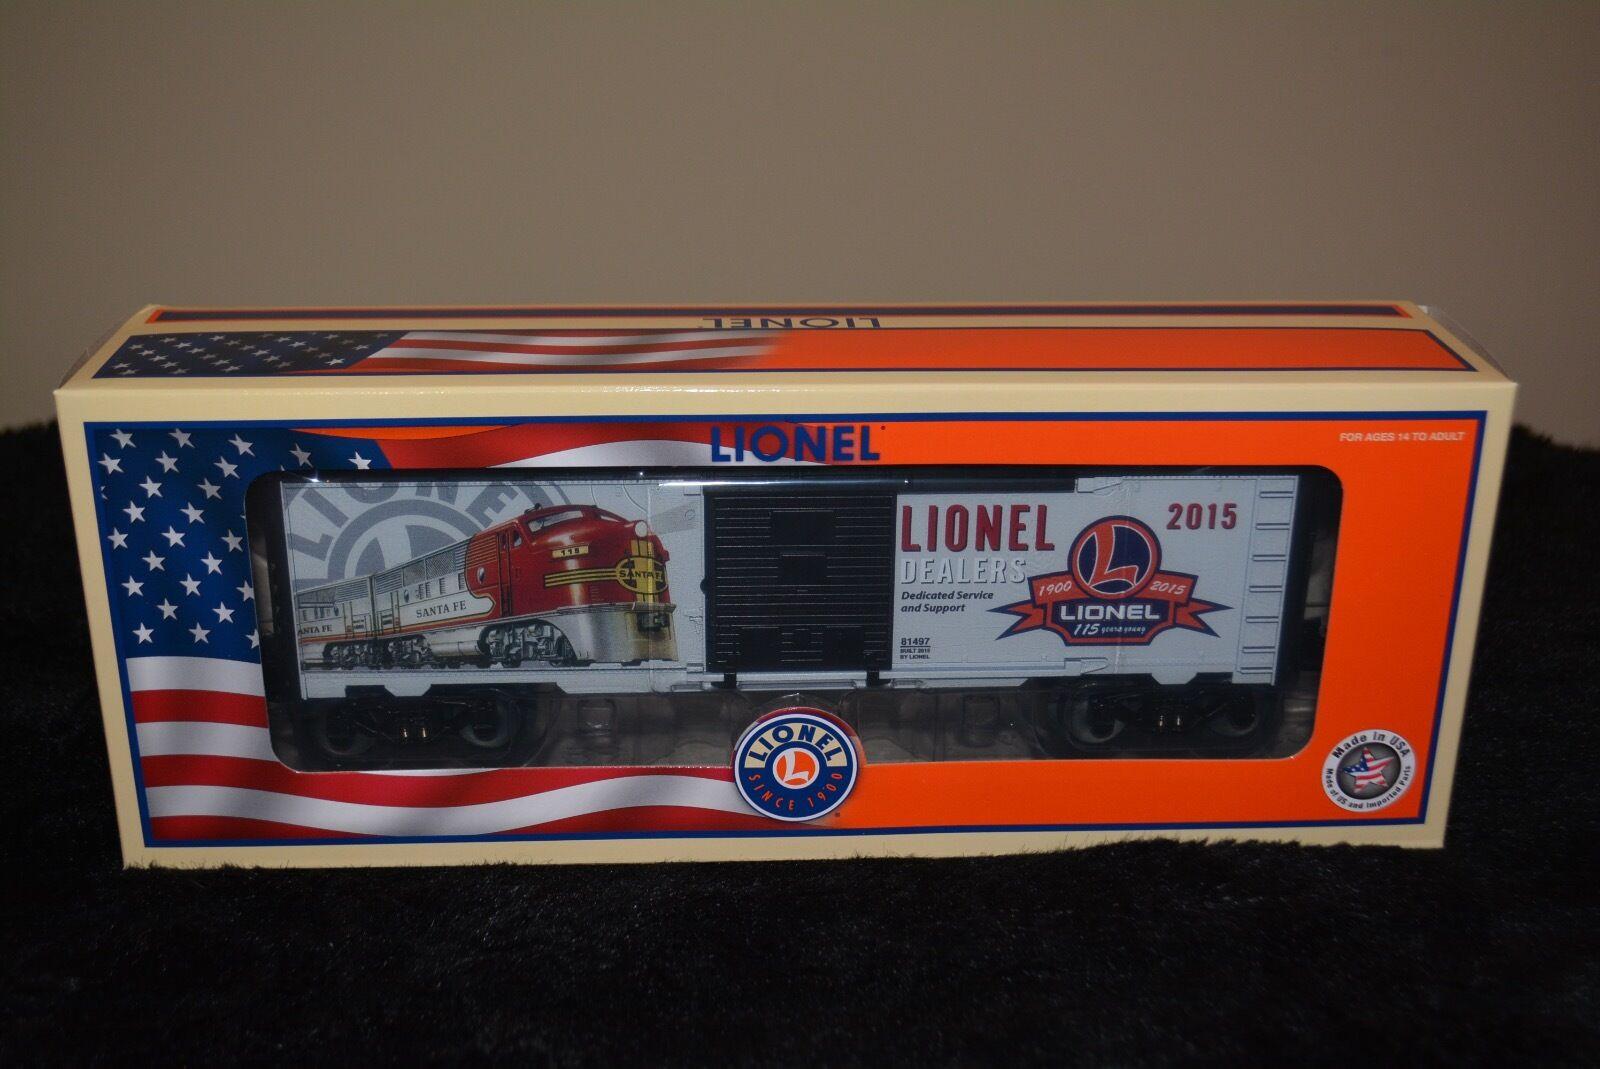 BRAND NEW IN BOX Lionel 2015 Dealer Boxcar 6-81497